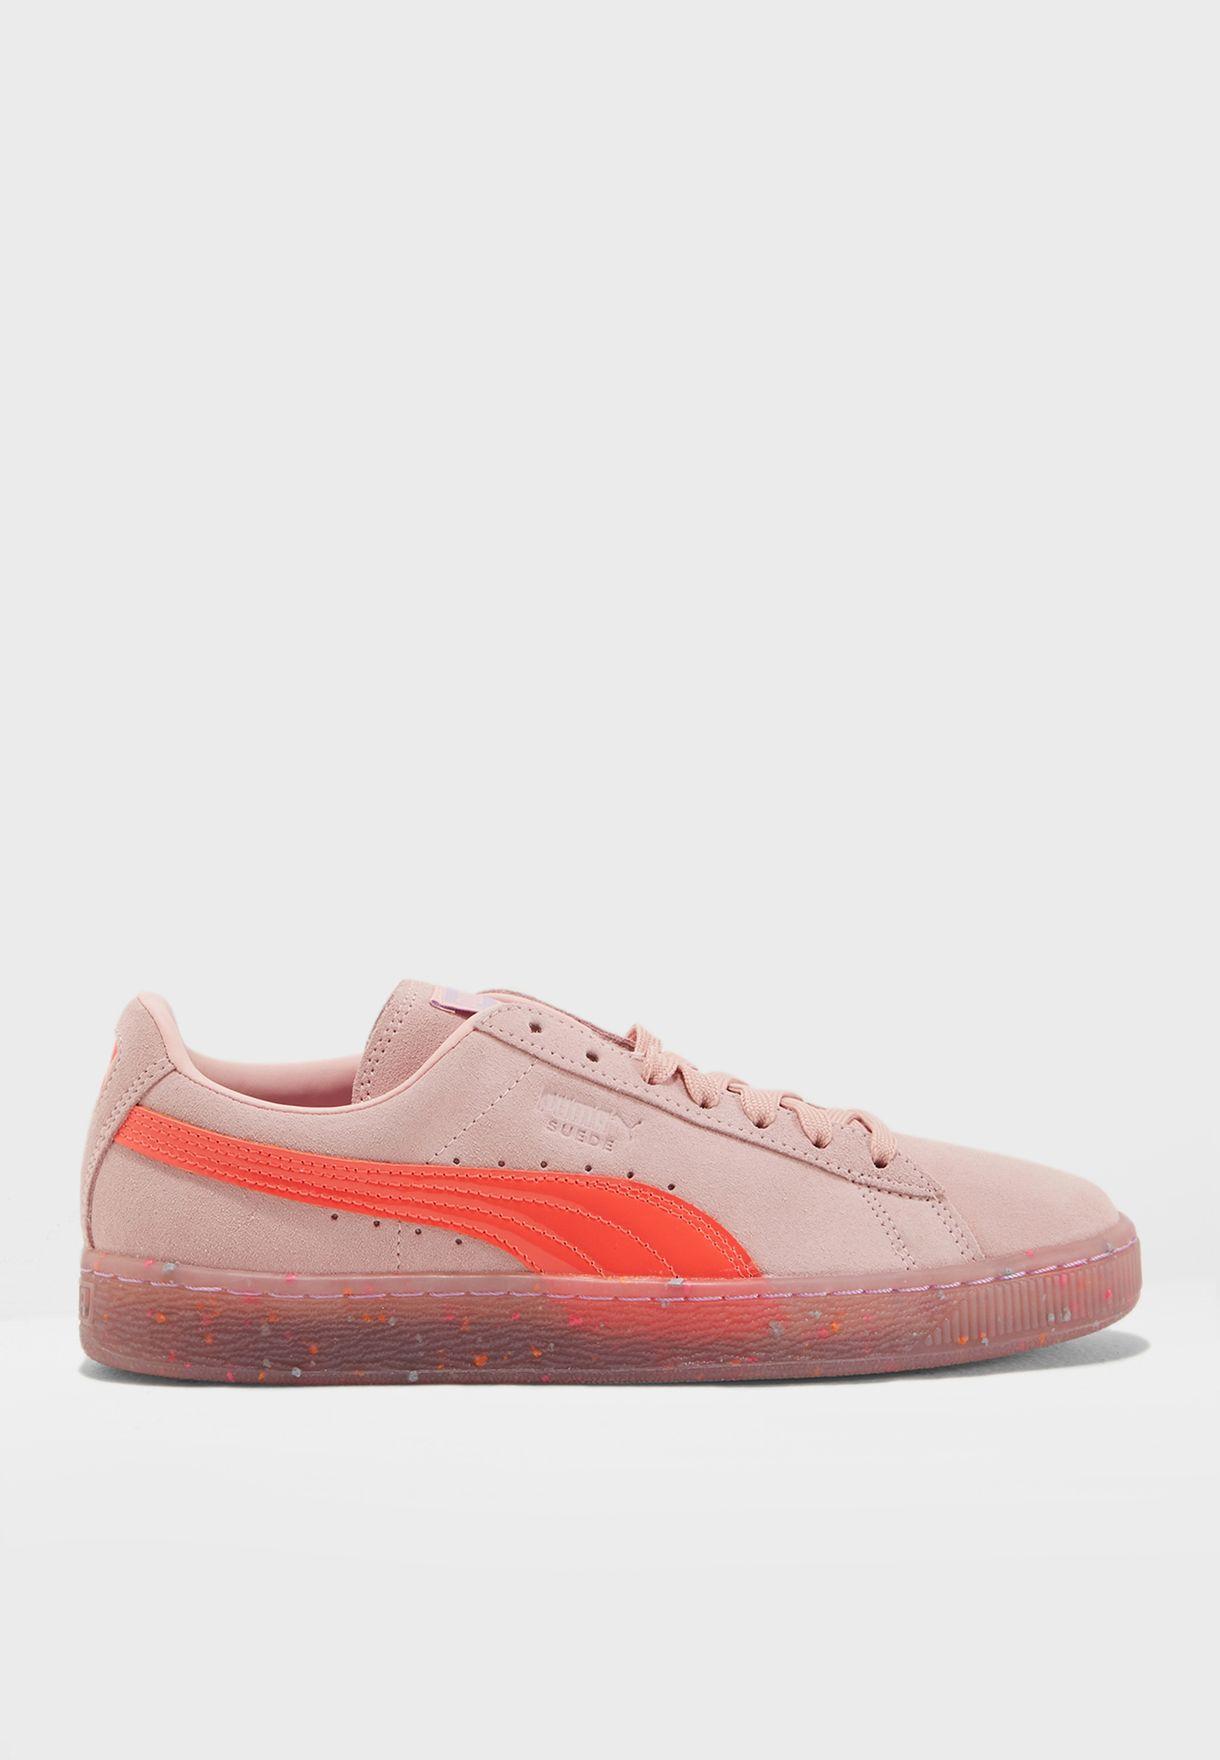 3b448b67f86 Shop PUMA pink Sophia Webster Suede 36473703 for Women in Saudi ...